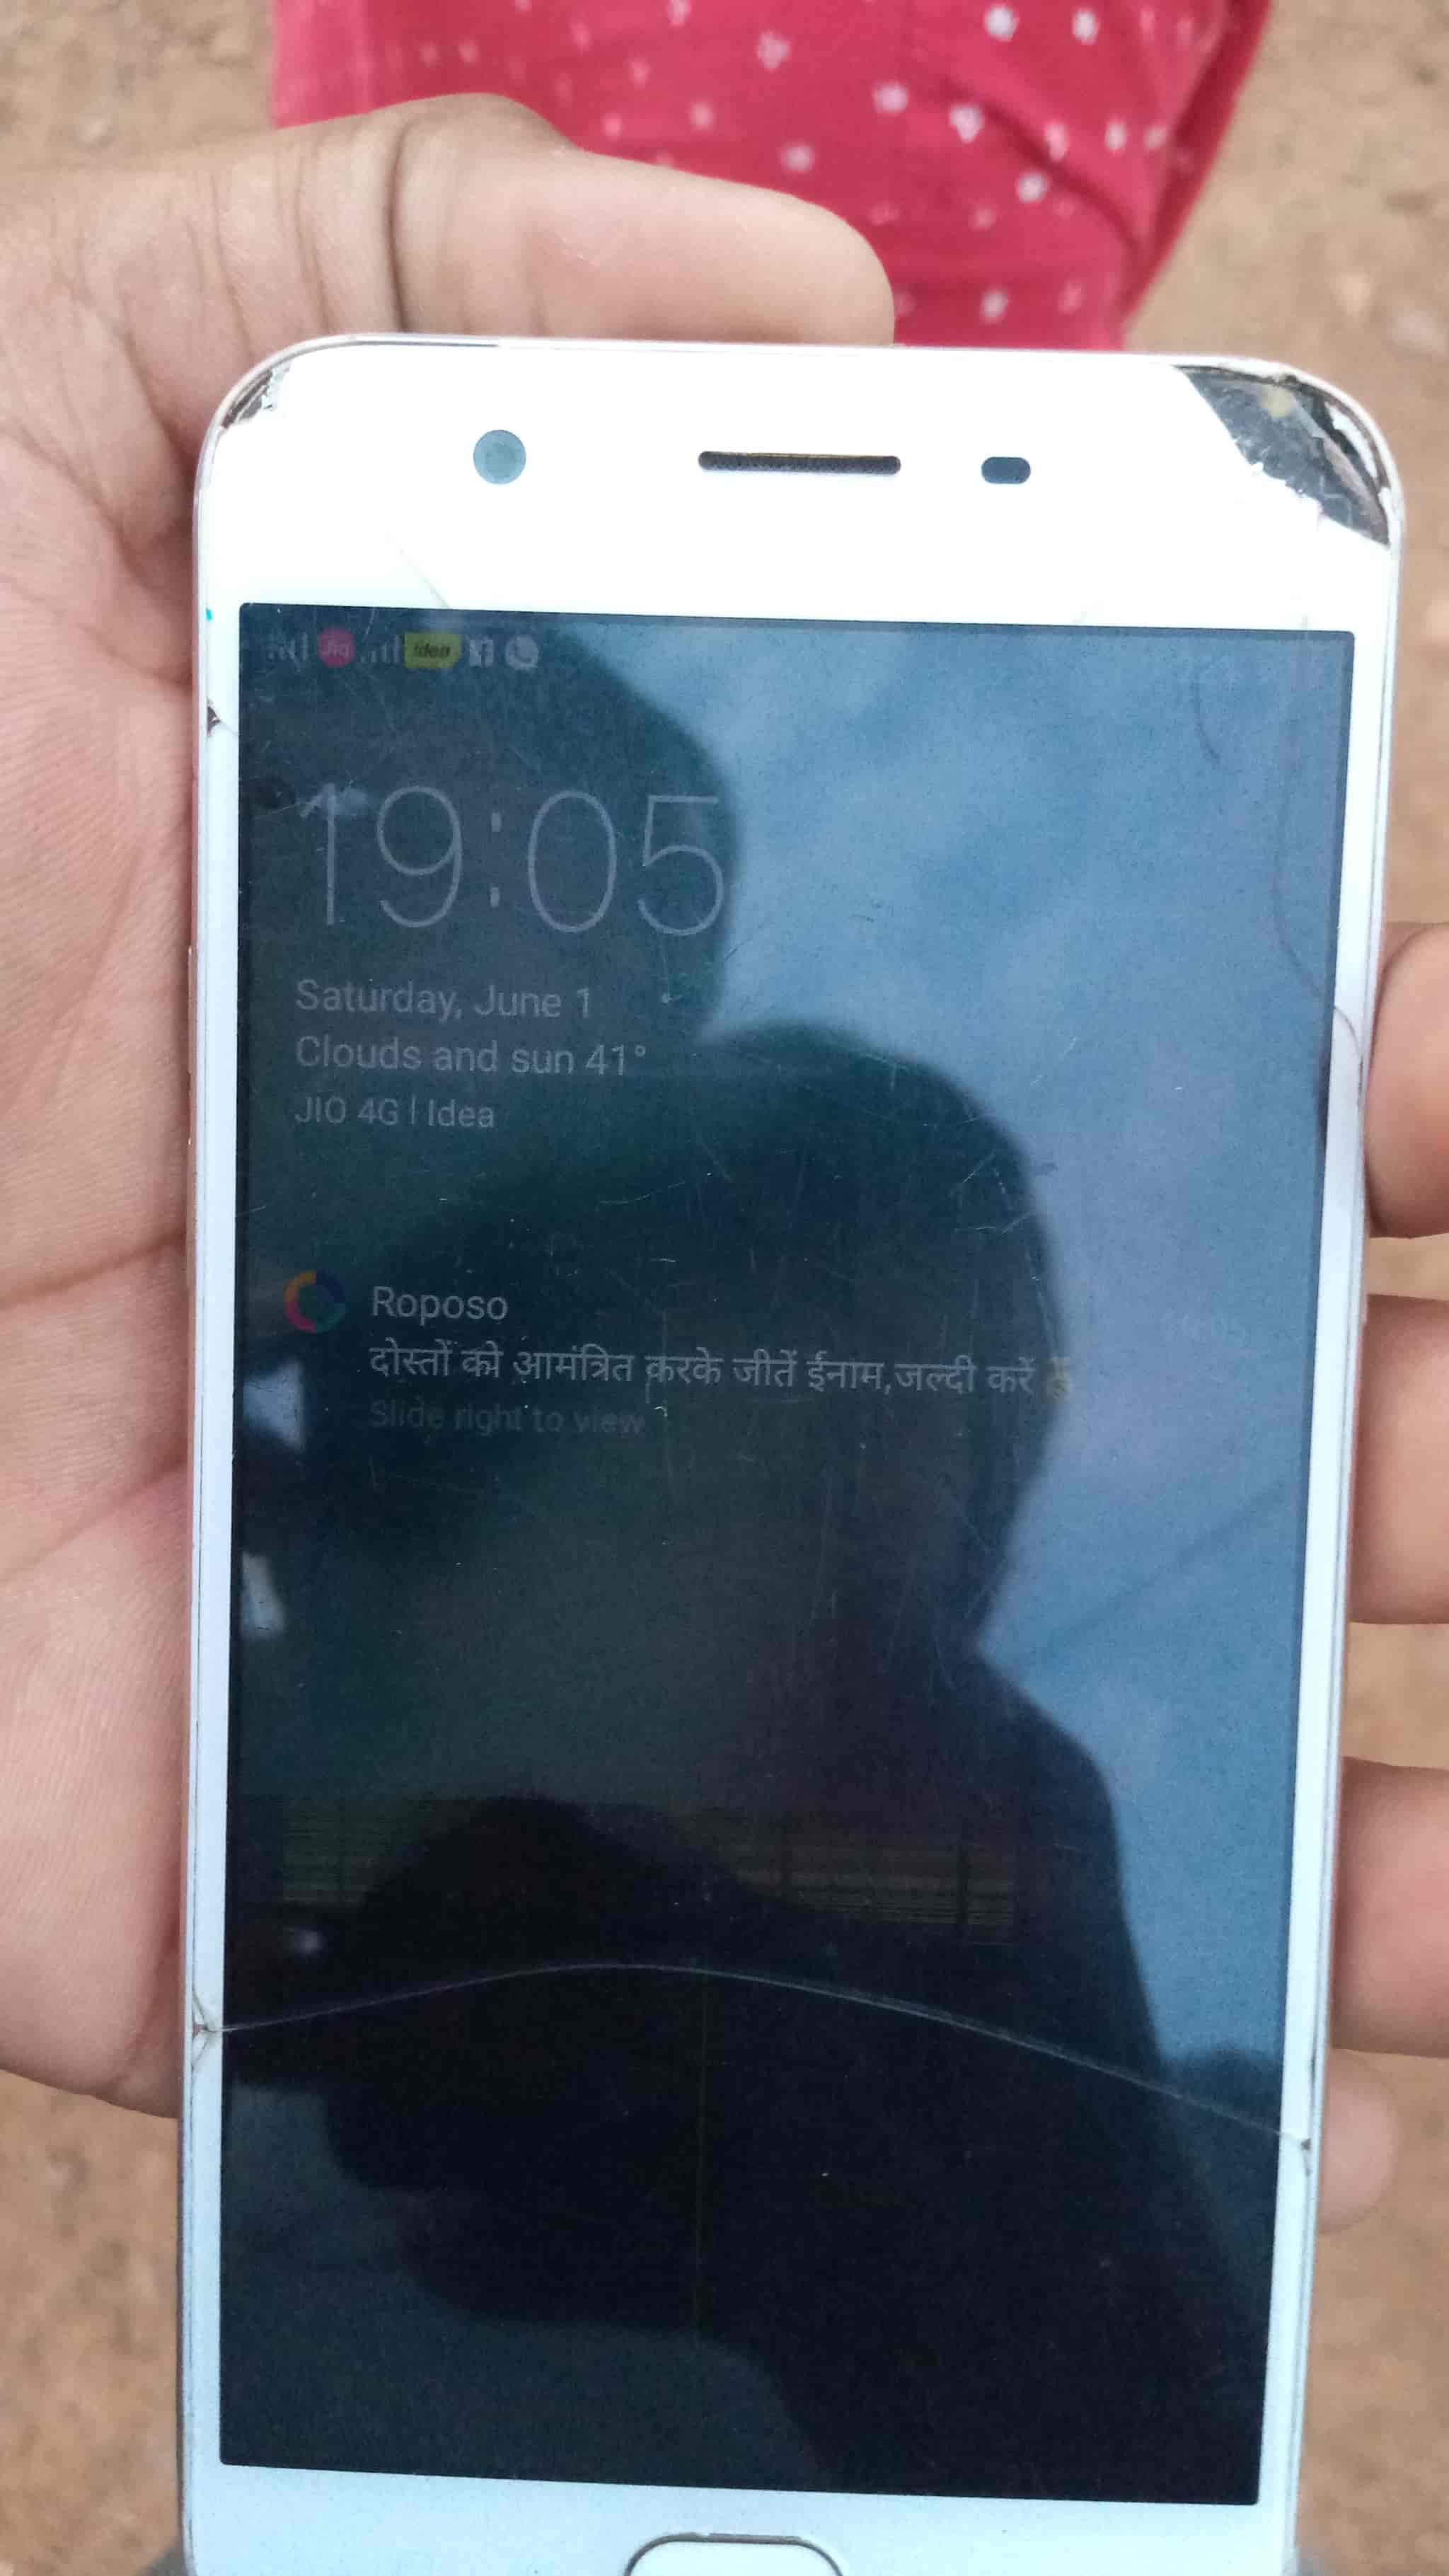 Oppo Service Center, Lashkar City - Mobile Phone Repair